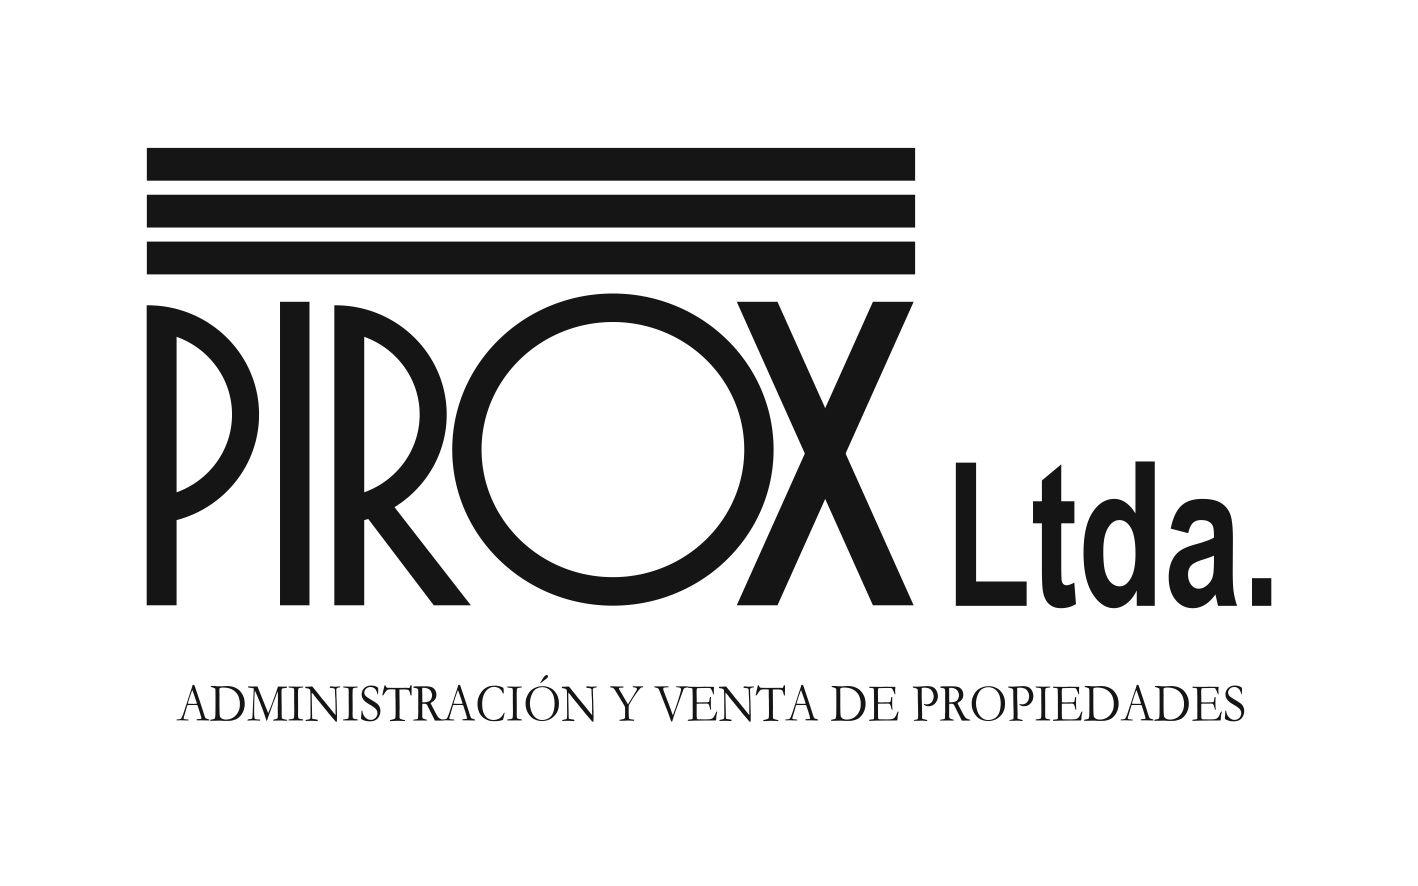 Pirox